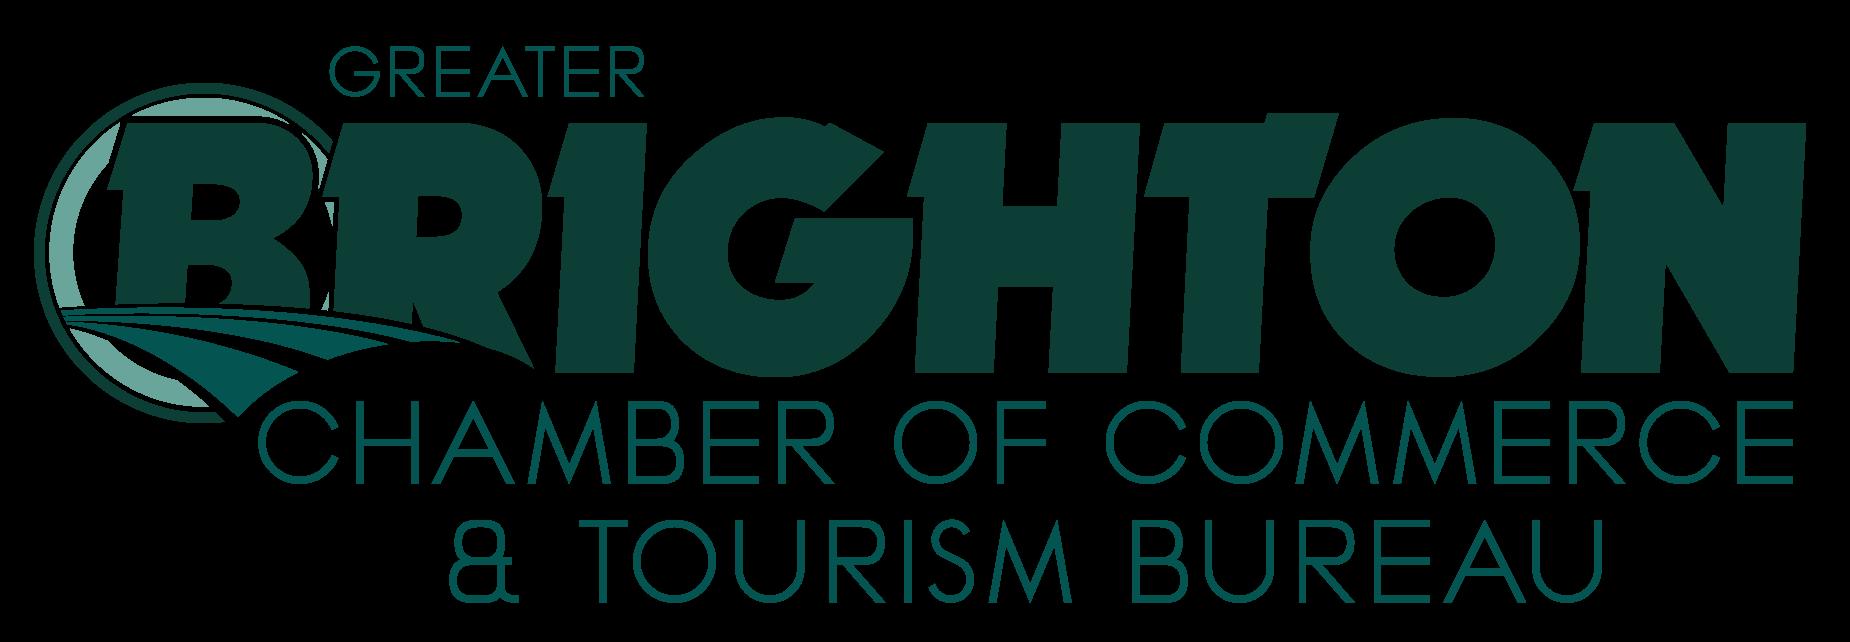 Greater Brighton Colorado Chamber of Commerce logo